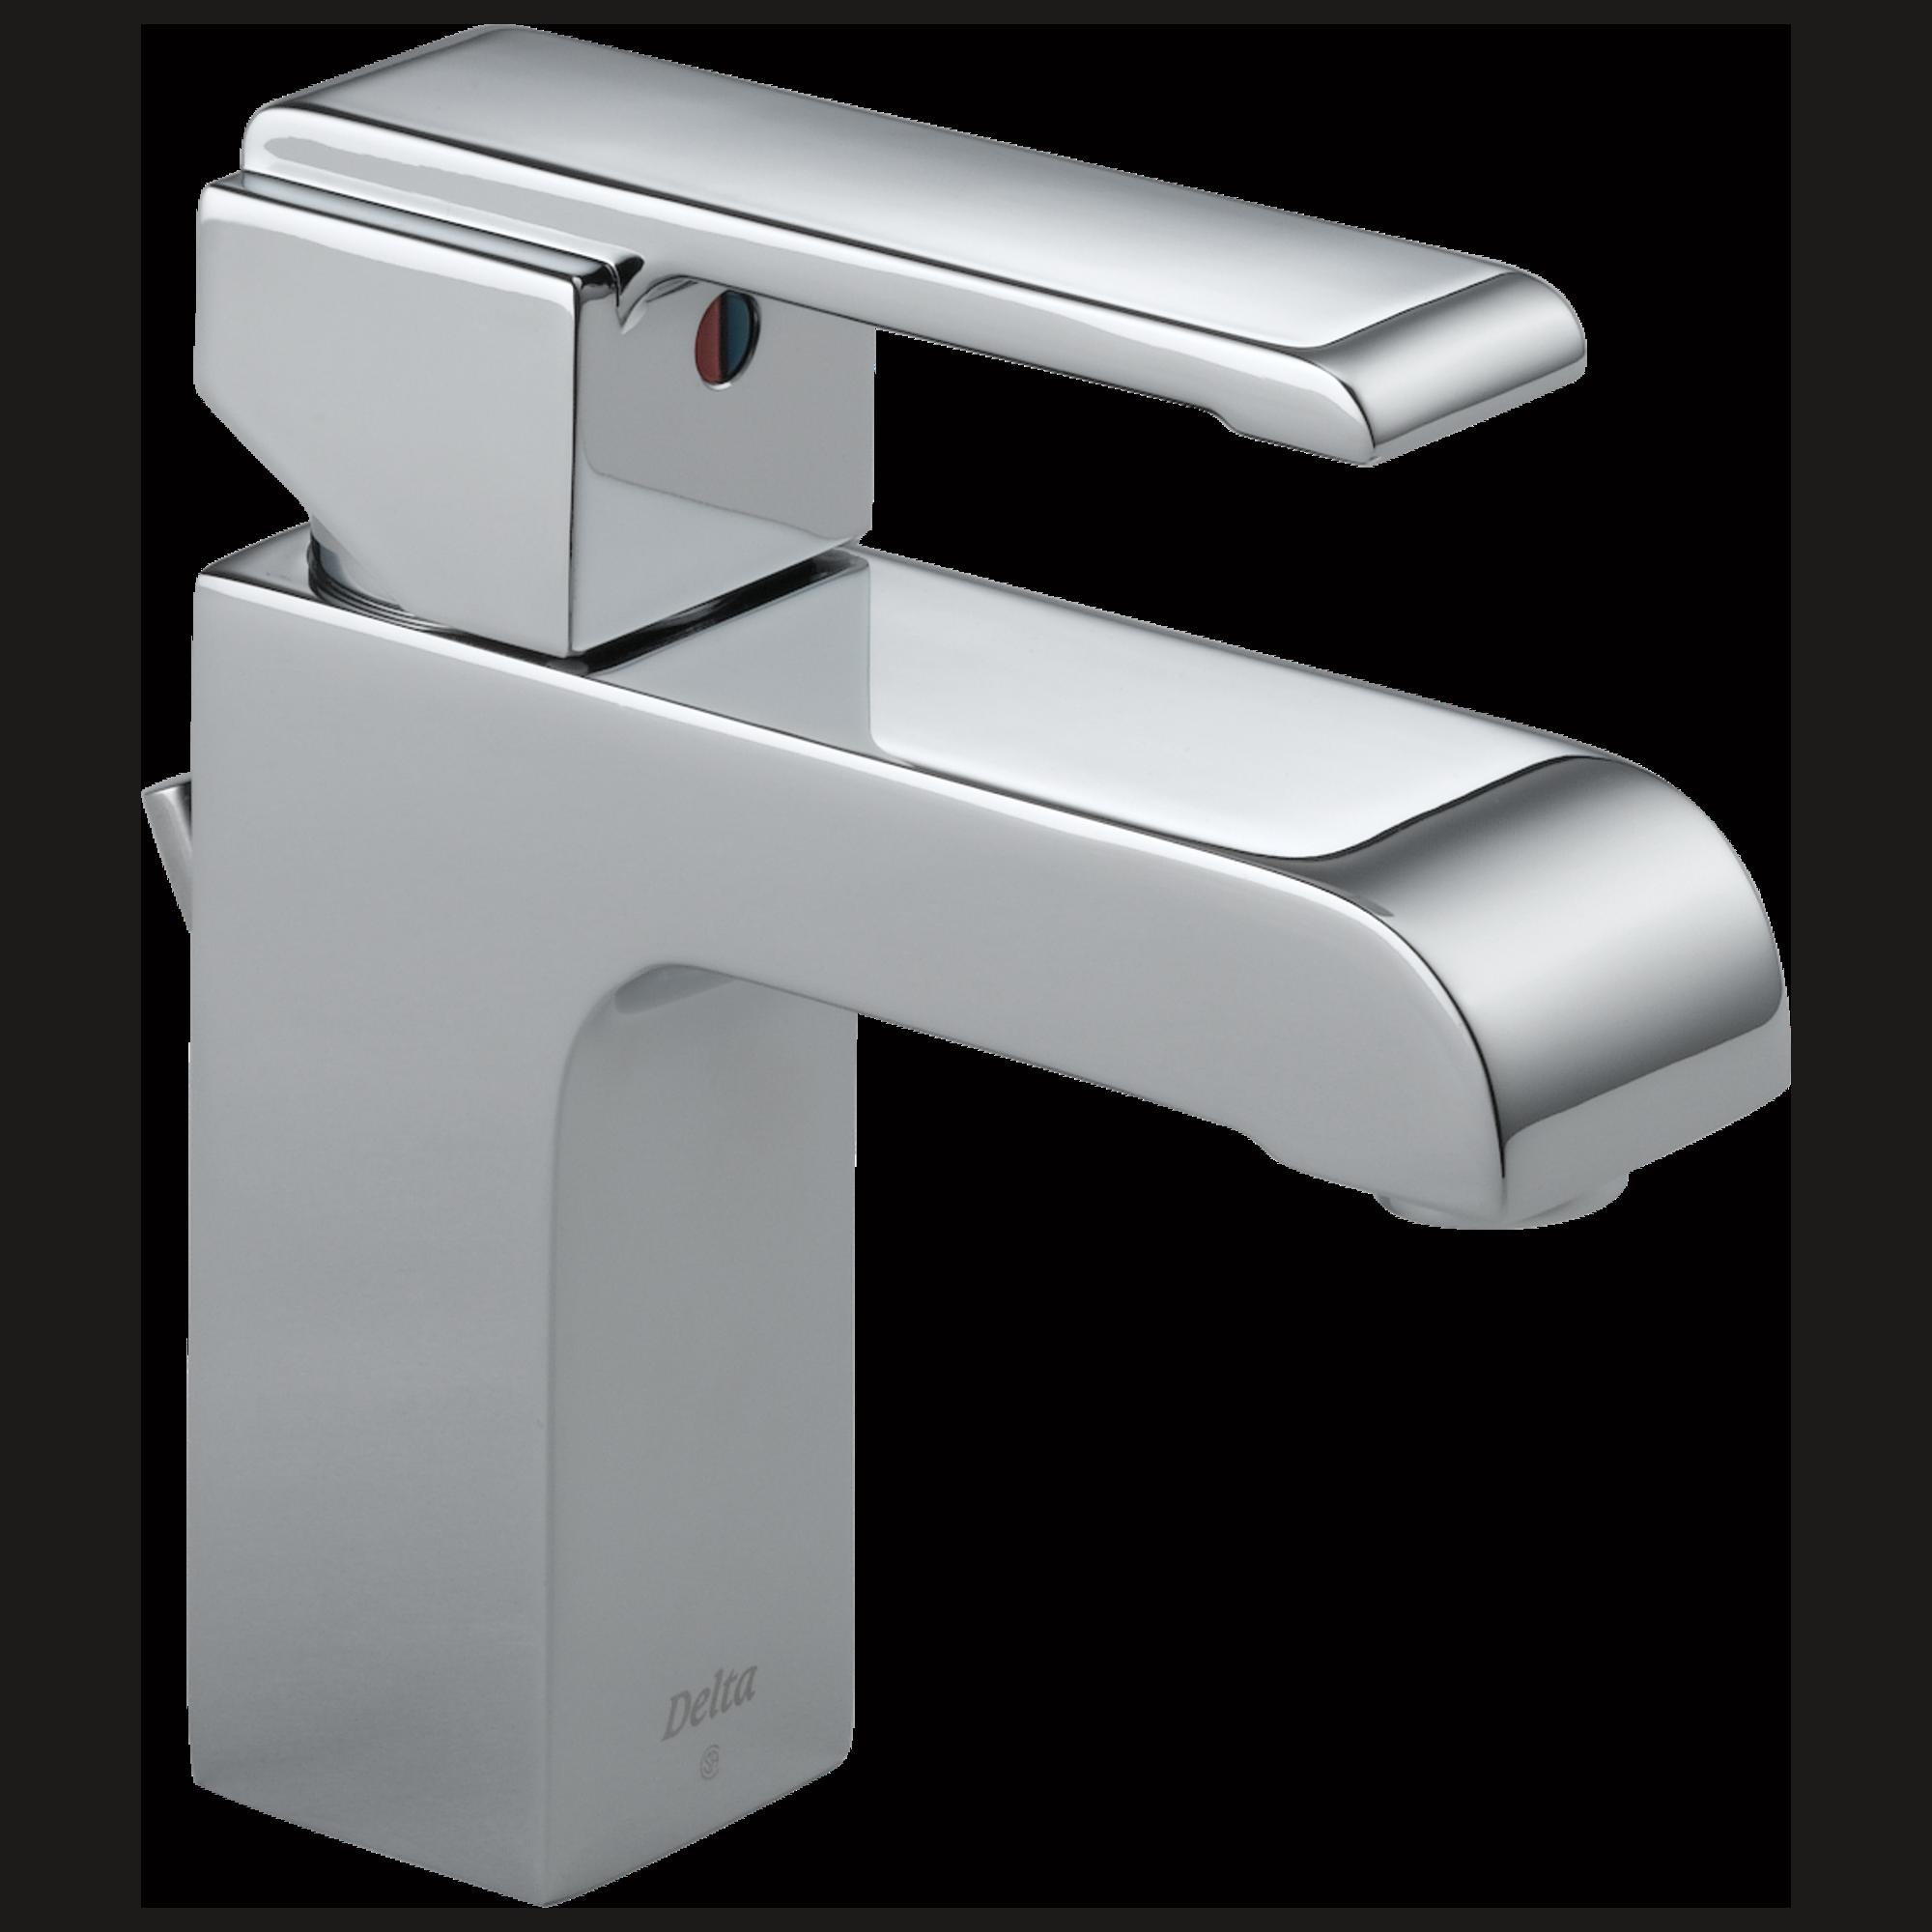 Delta Faucet Arzo 586lf Mpu Single Handle Centerset Bathroom Faucet Chrome Bathroom Faucets Sink Faucets Bathroom Sink Faucets [ 2000 x 2000 Pixel ]